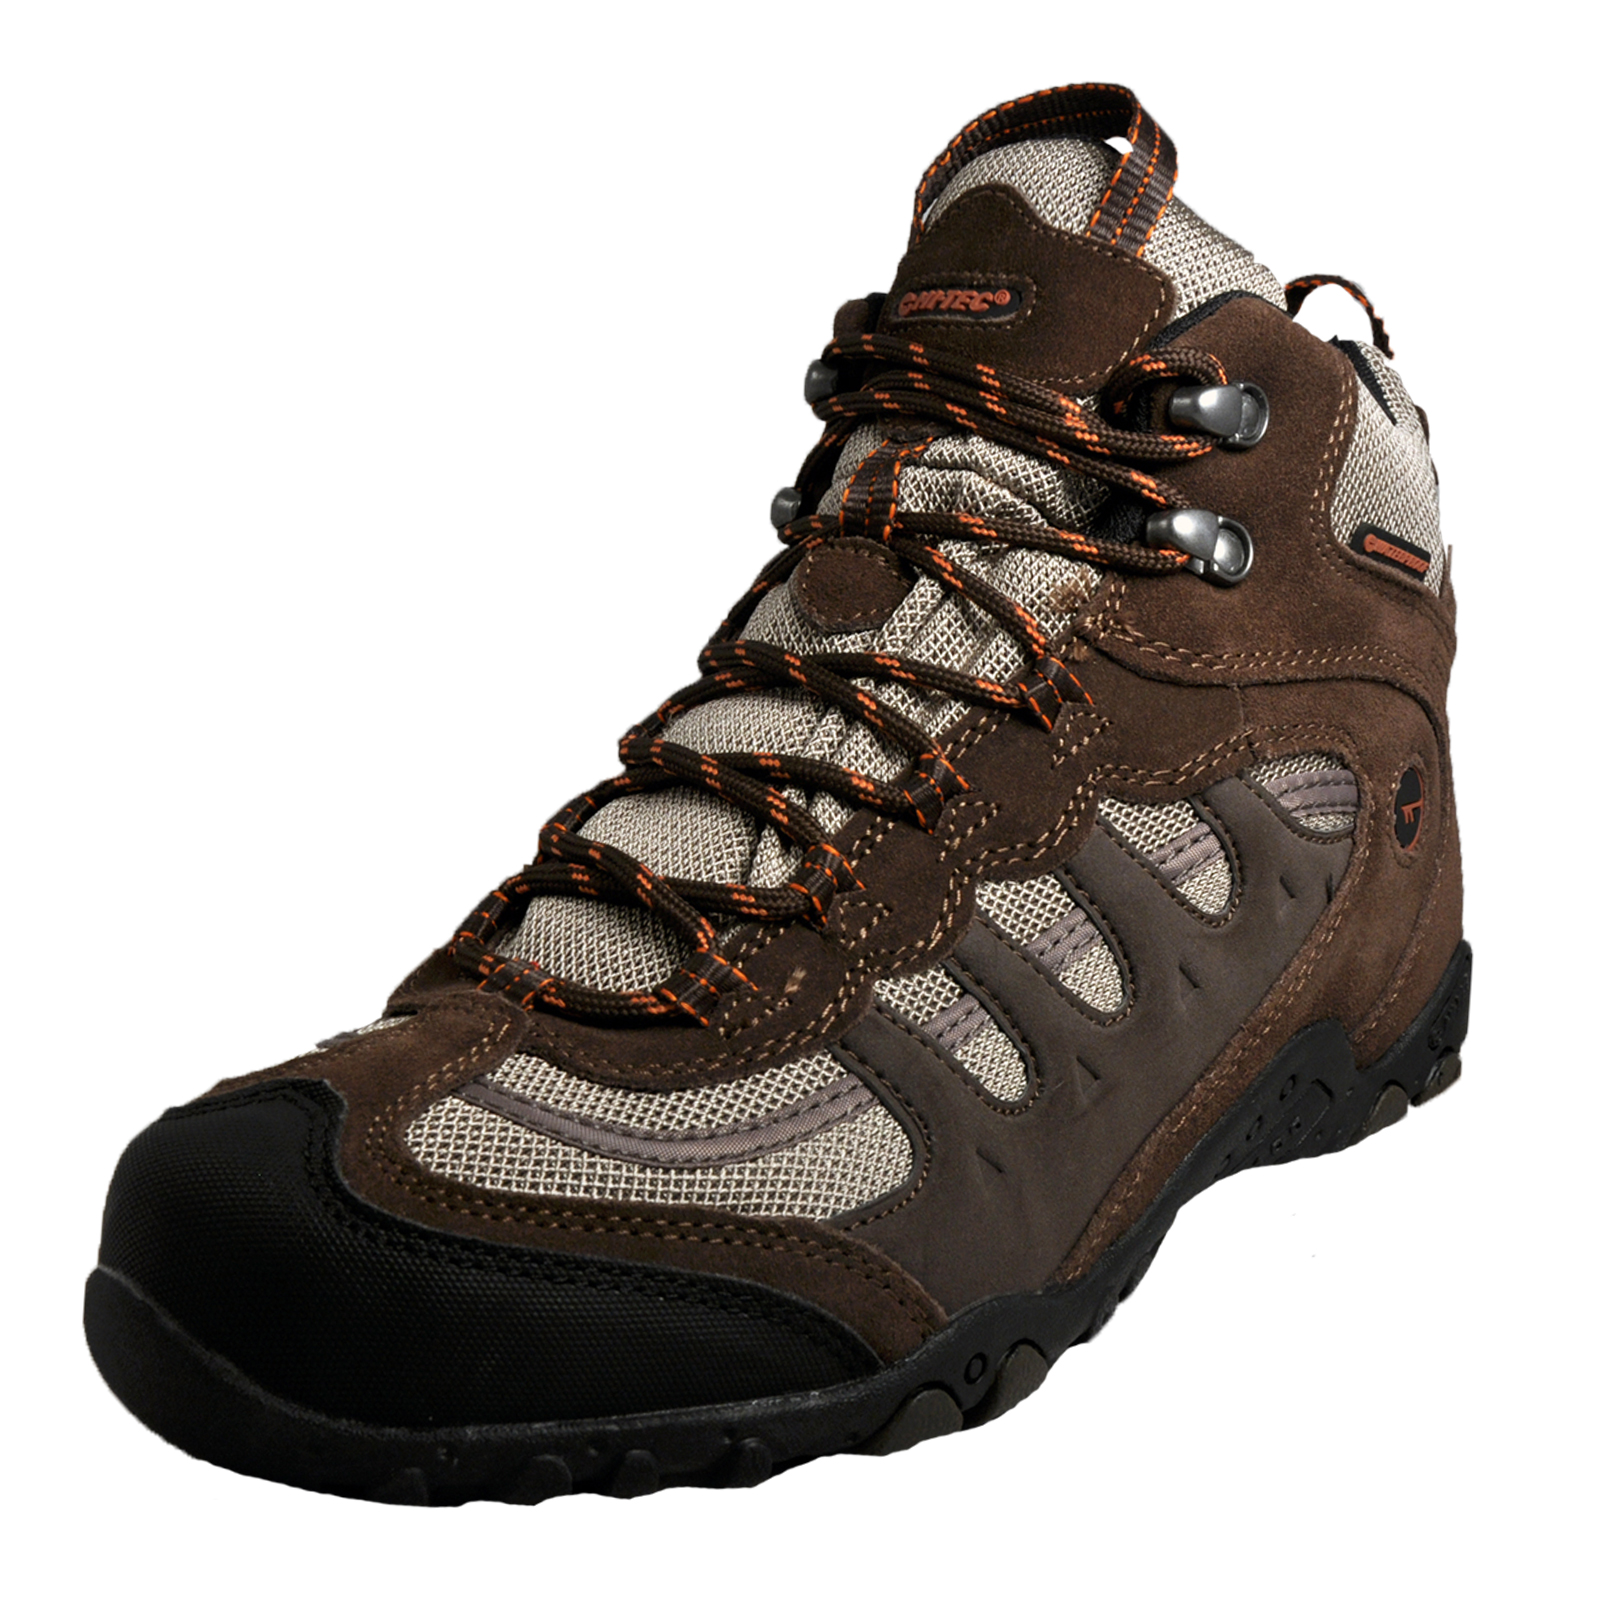 45d0d61653276 Details about Hi Tec Penrith Mid WP Mens Waterproof All Terrain Hiking  Boots Brown